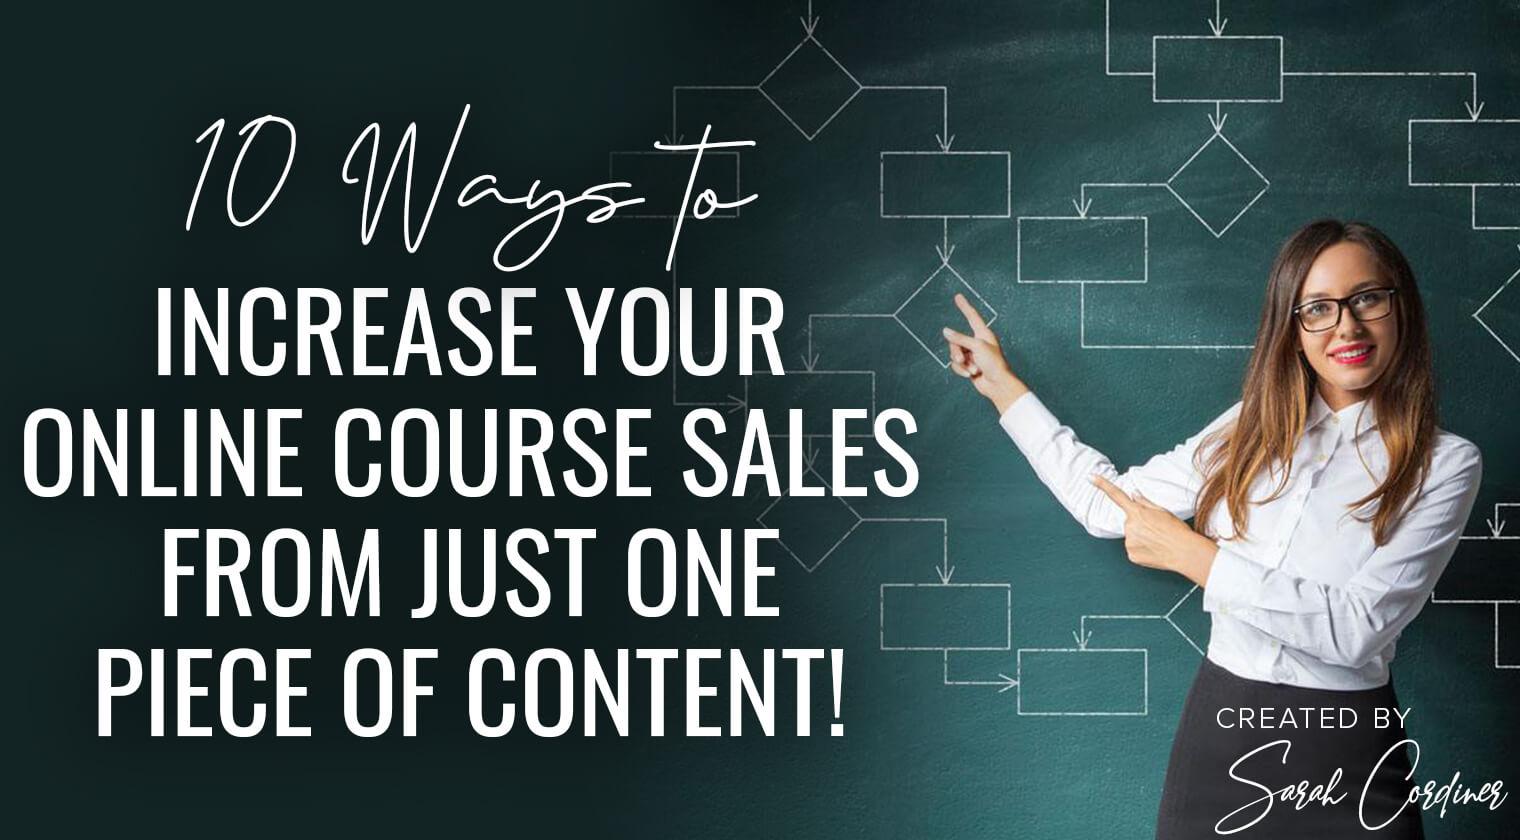 10 ways increase online course sales one piece content